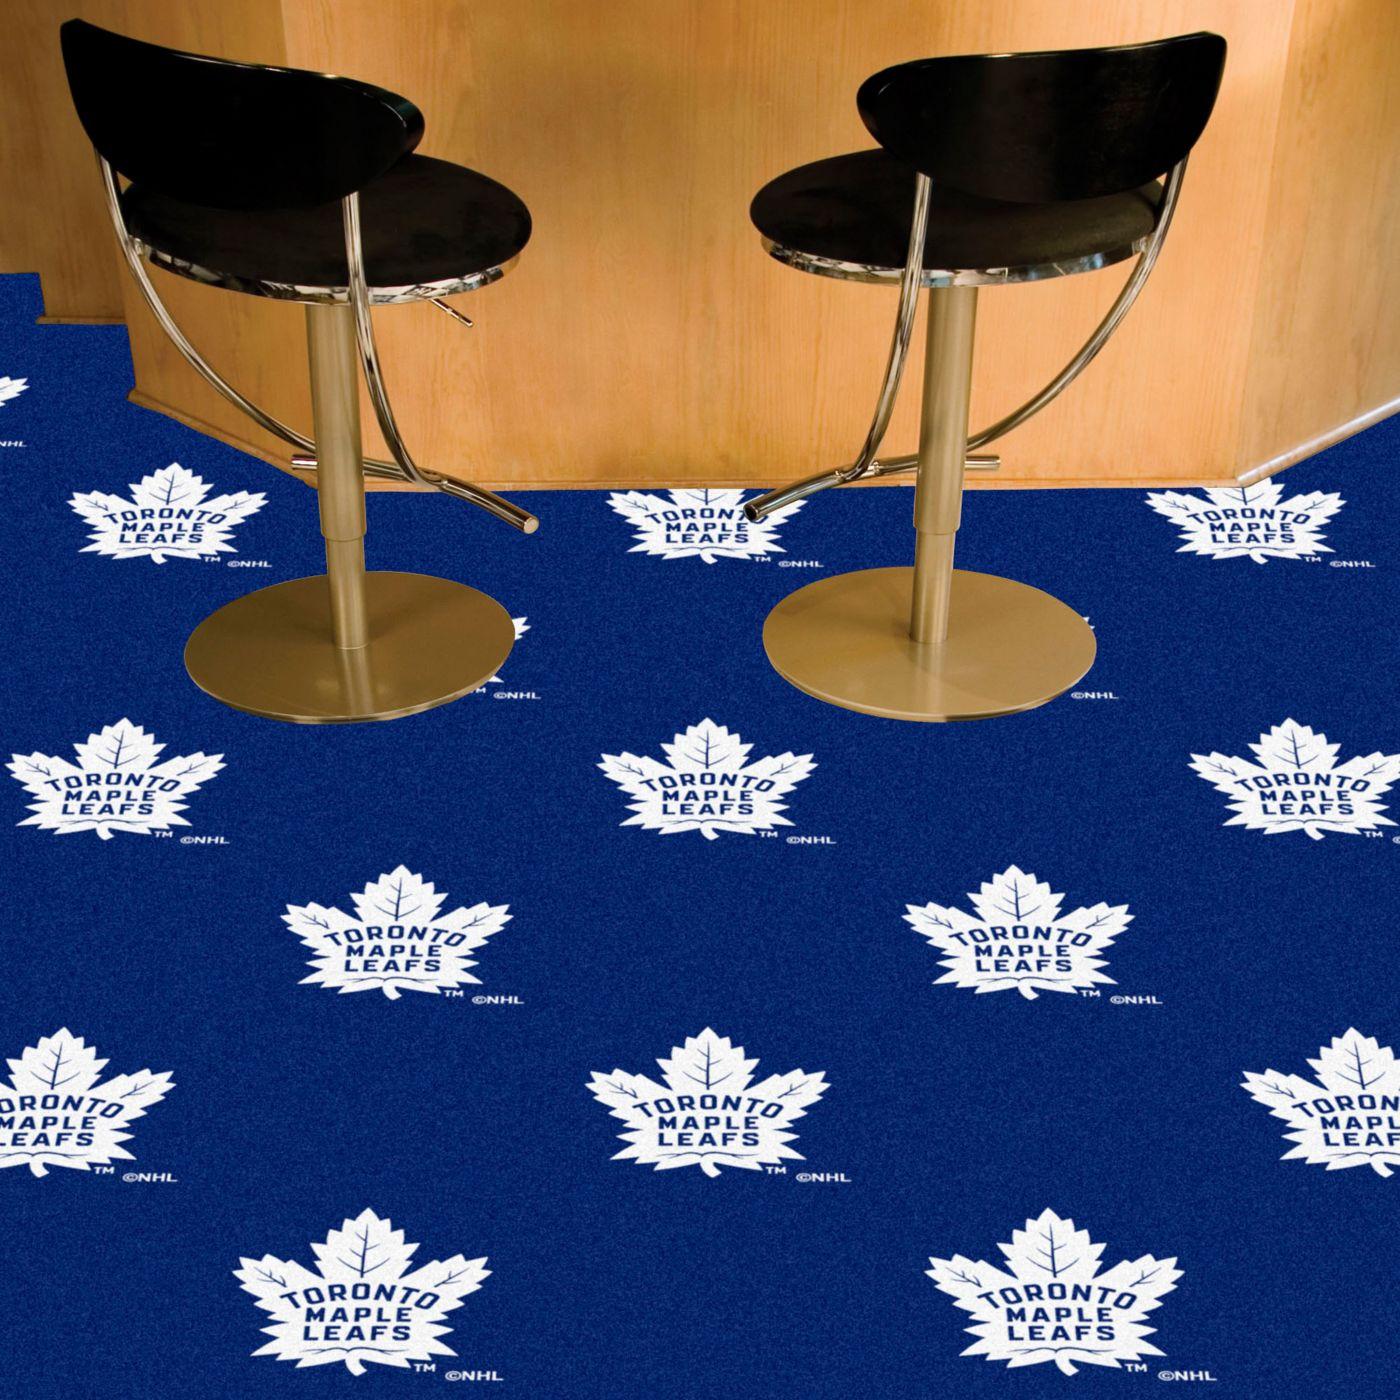 FANMATS Toronto Maple Leafs Carpet Tiles